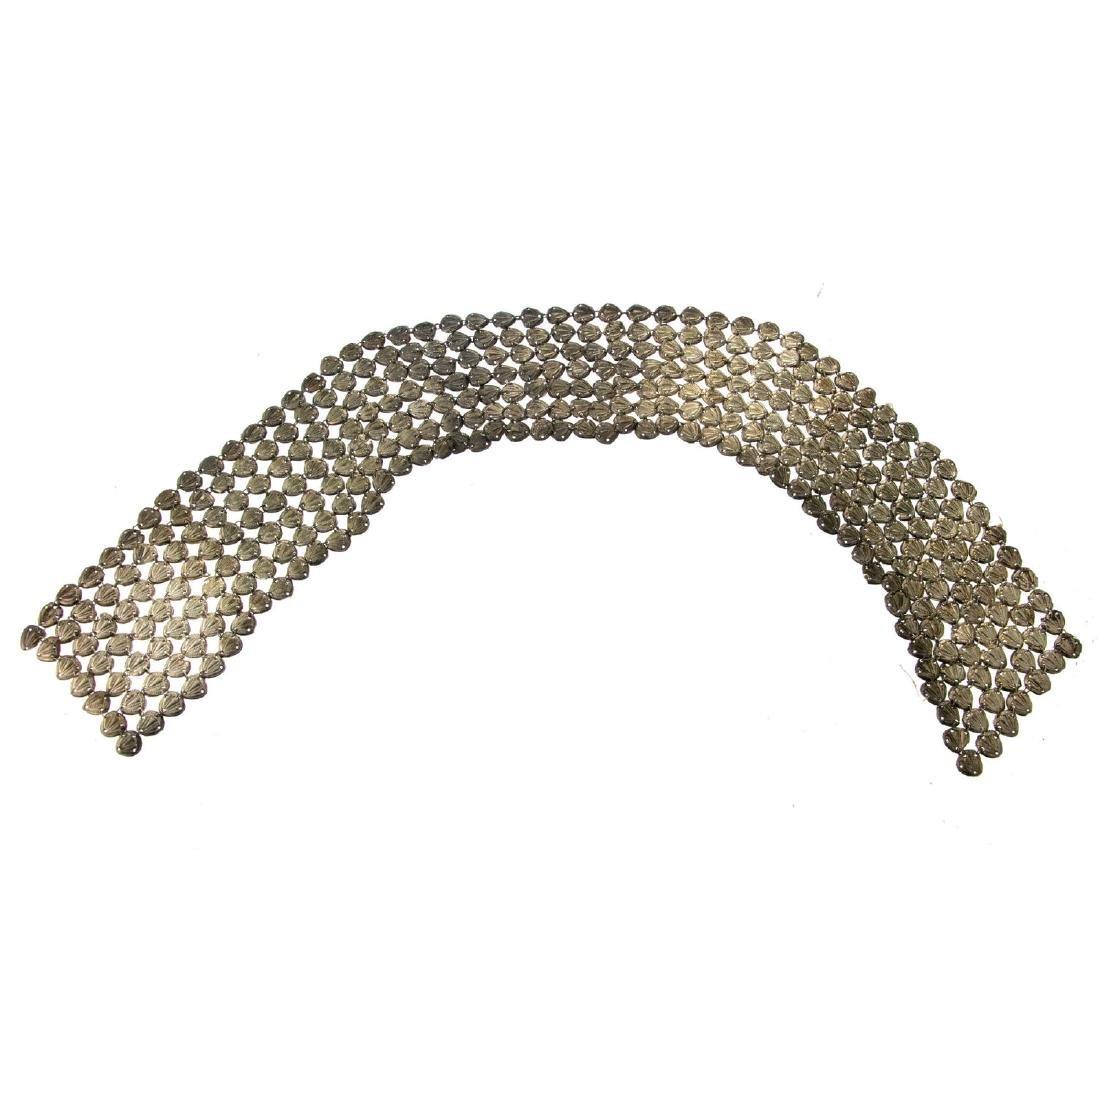 Silver Tallit (Praying Shawl) Ornament.